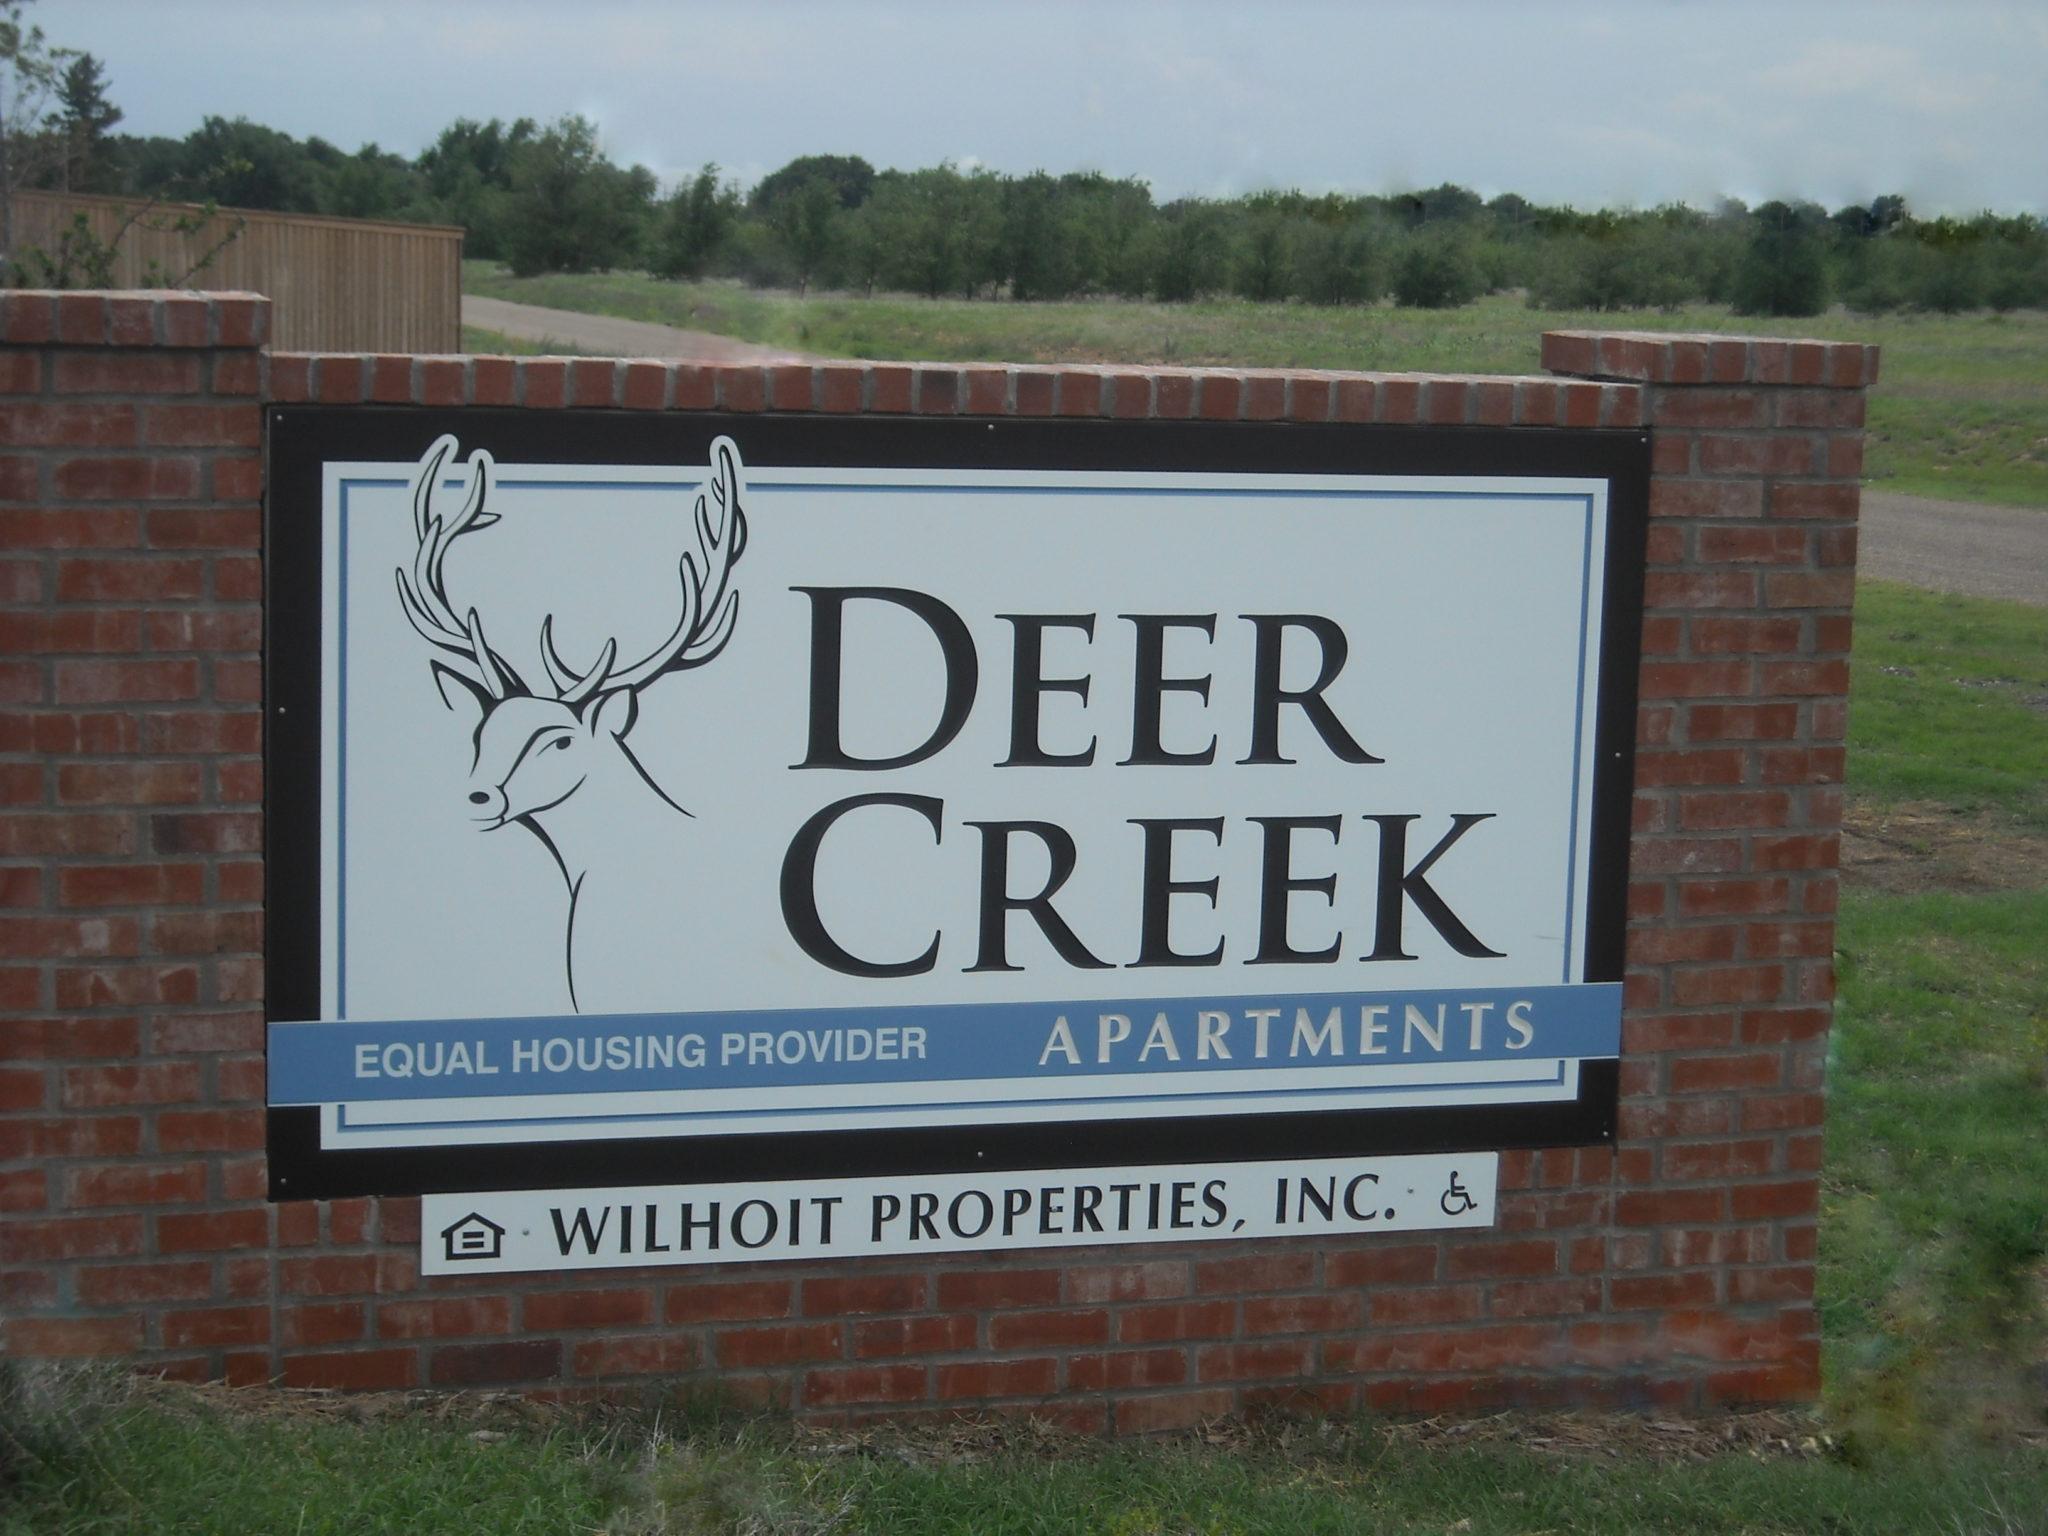 ADeer-Creek-Levelland-Texas-Sign-001.bmp